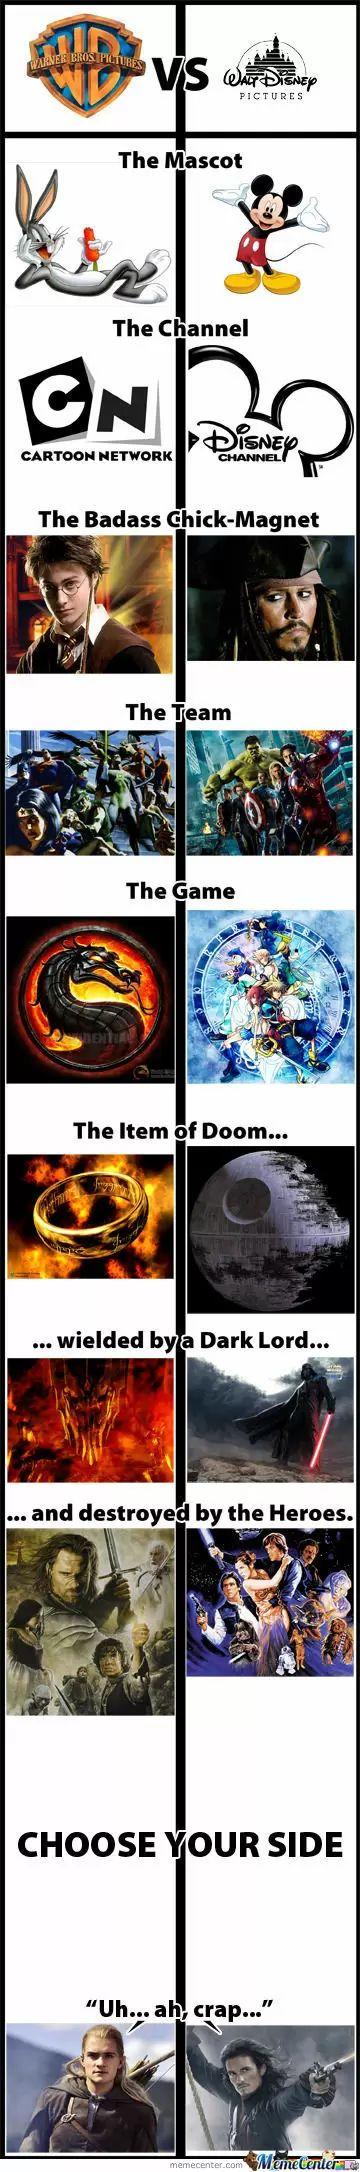 WB vs. Disney